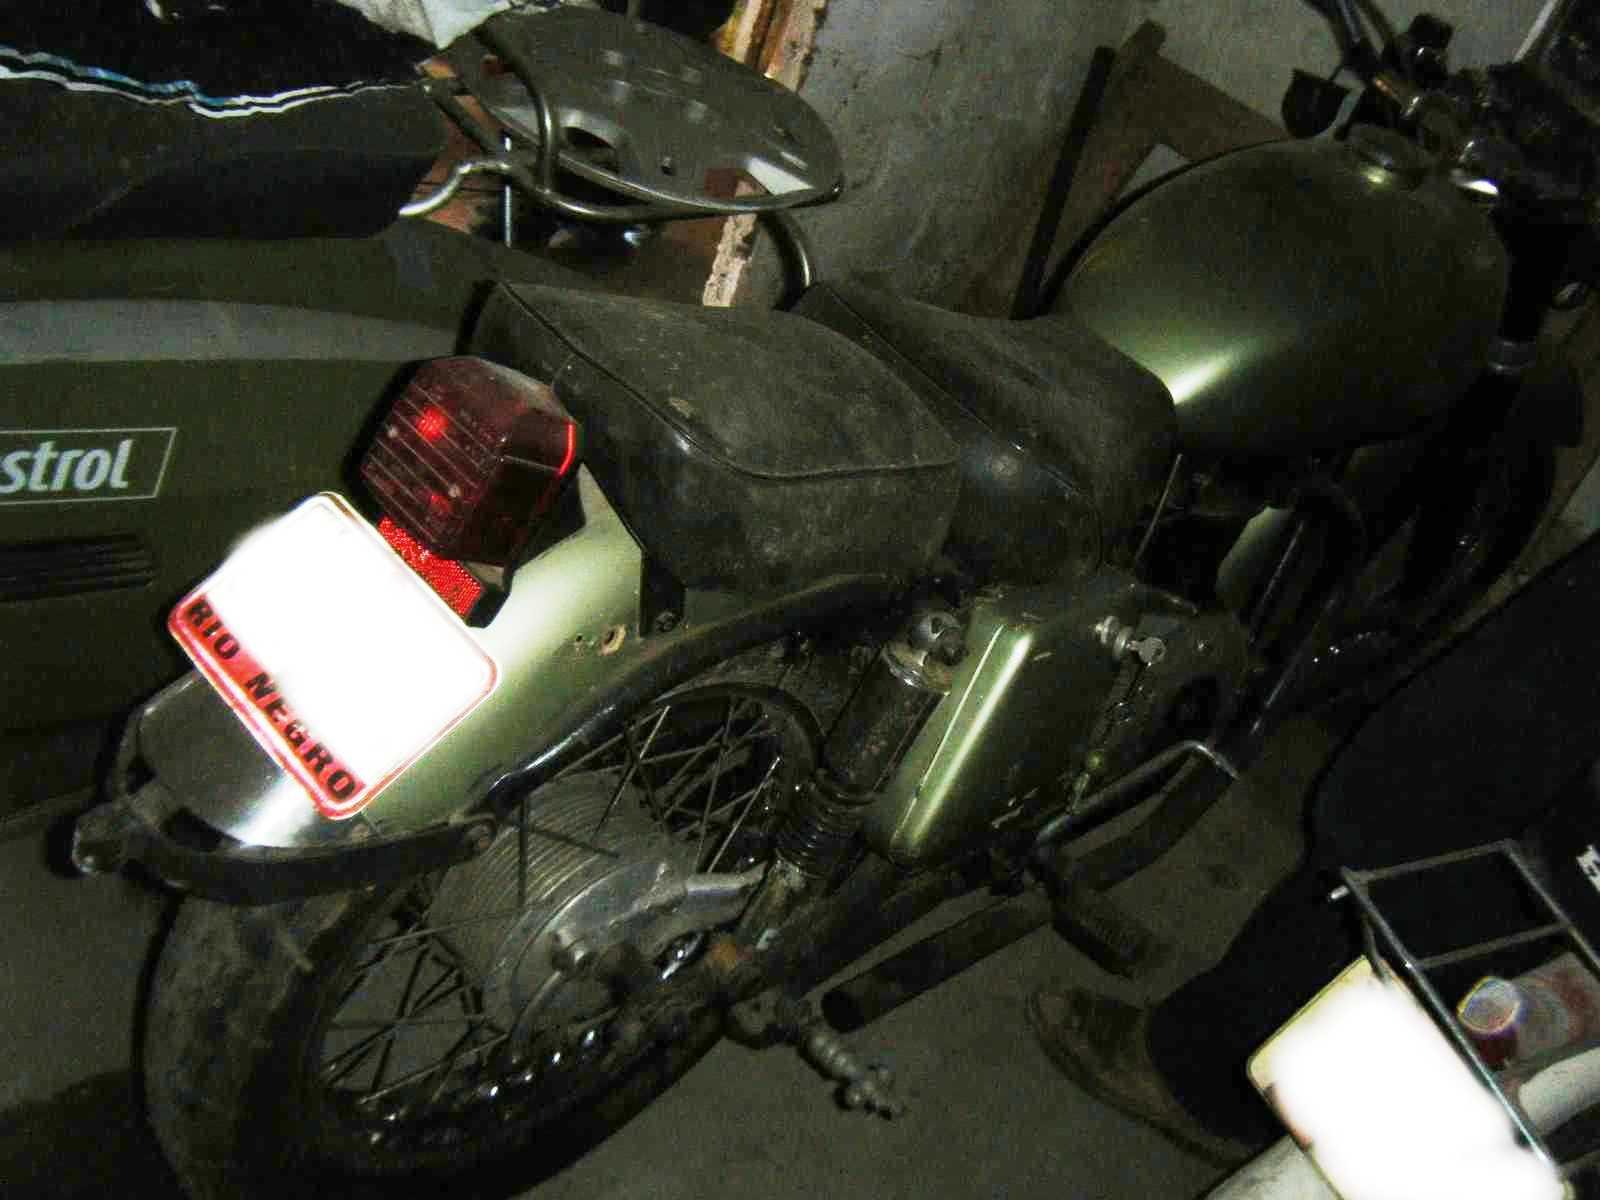 upablo-moto-horex-350cc-ano-1948-2 Moto Horex 350cc (ano 1948)